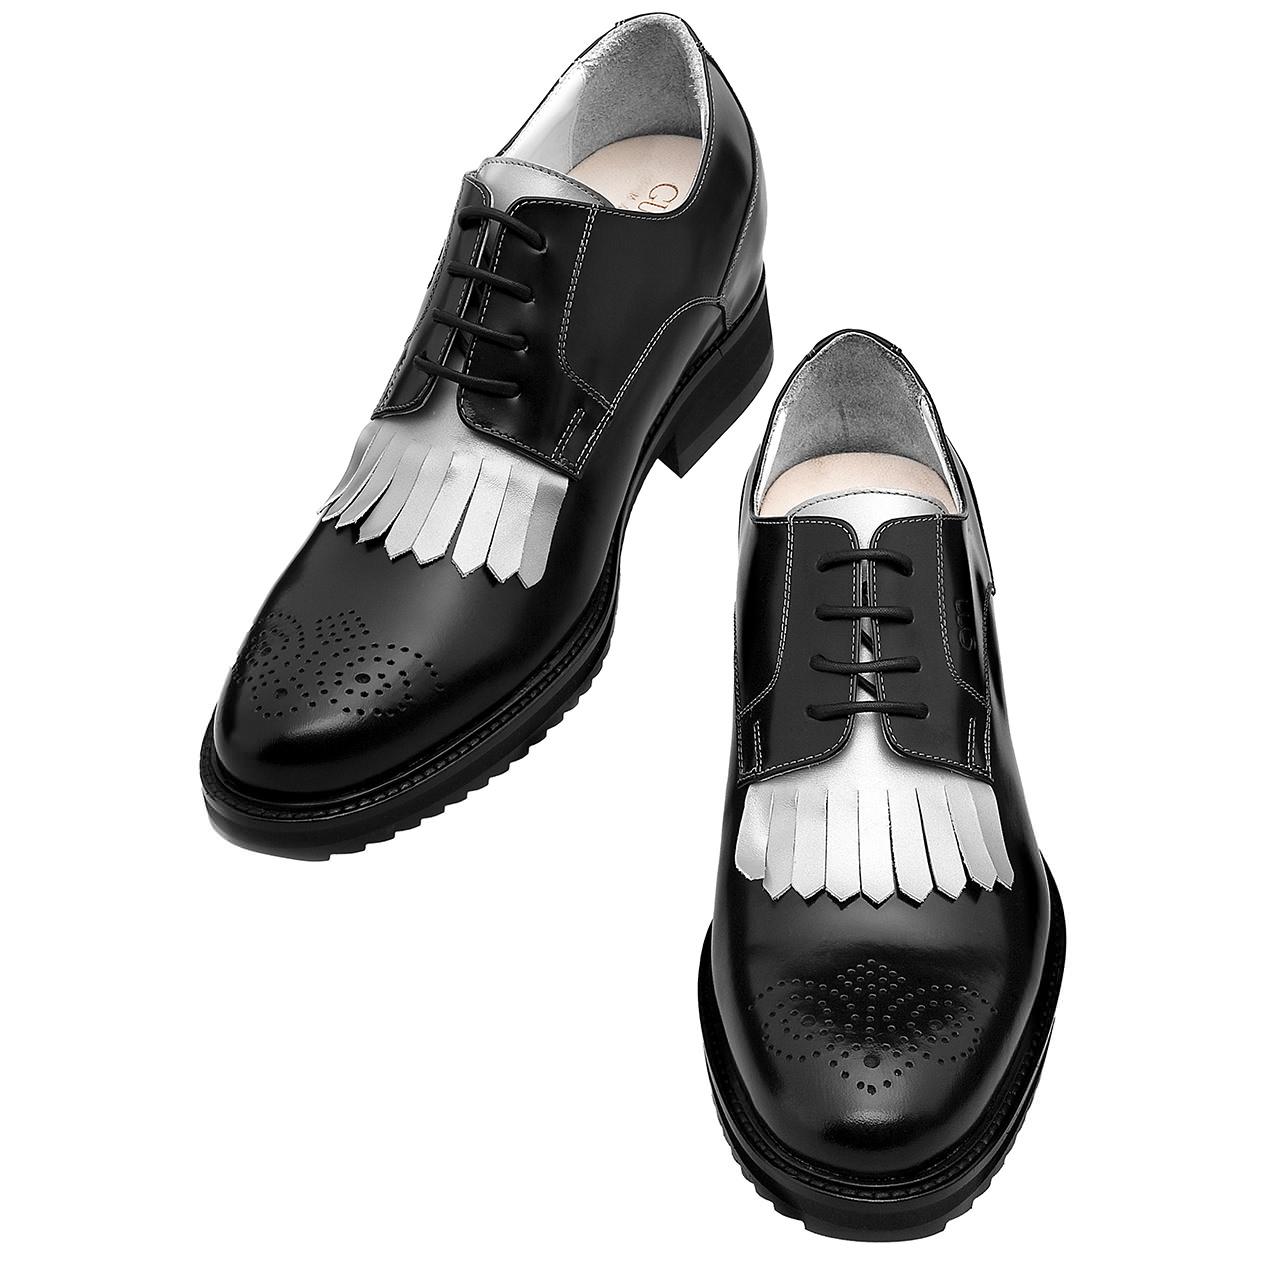 77766a88b154 San Francisco - Elevator Dress Shoes